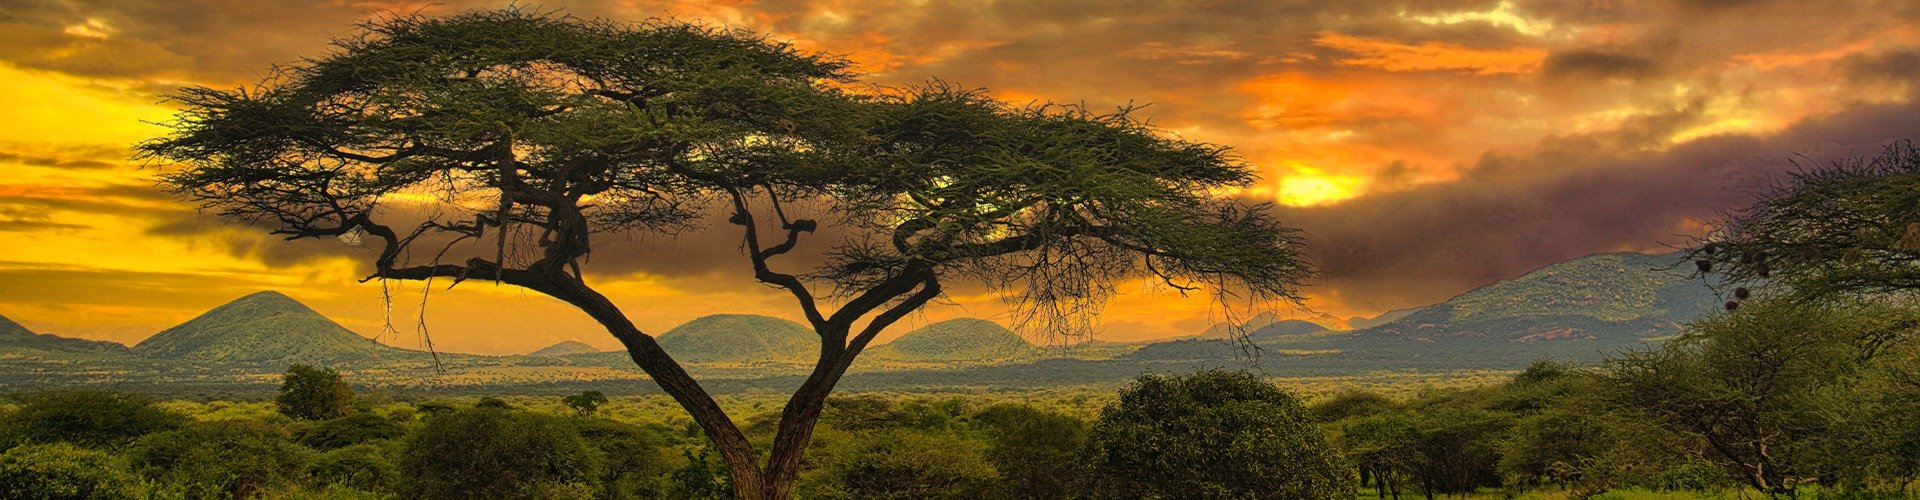 Familienurlaub in Kenia